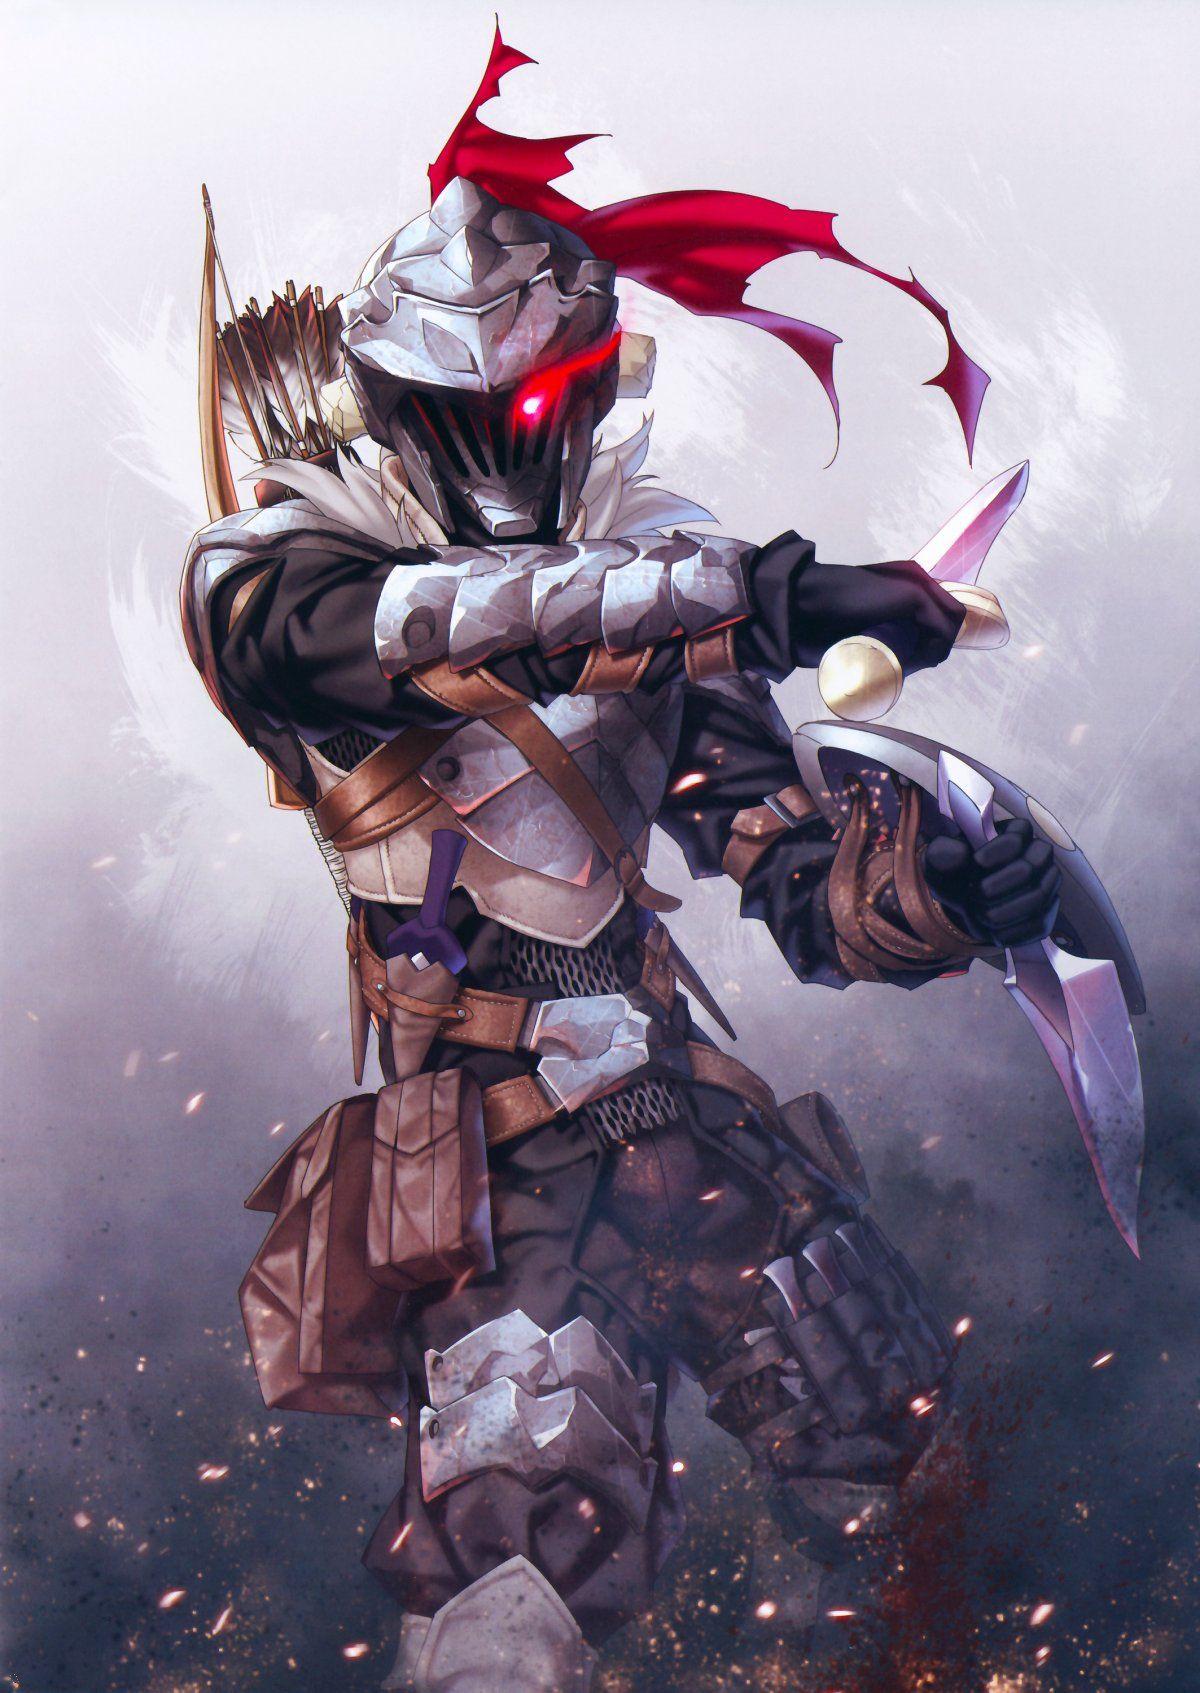 Goblin Slayer By Kannatsuki Noboru In 2020 Slayer Anime Goblin